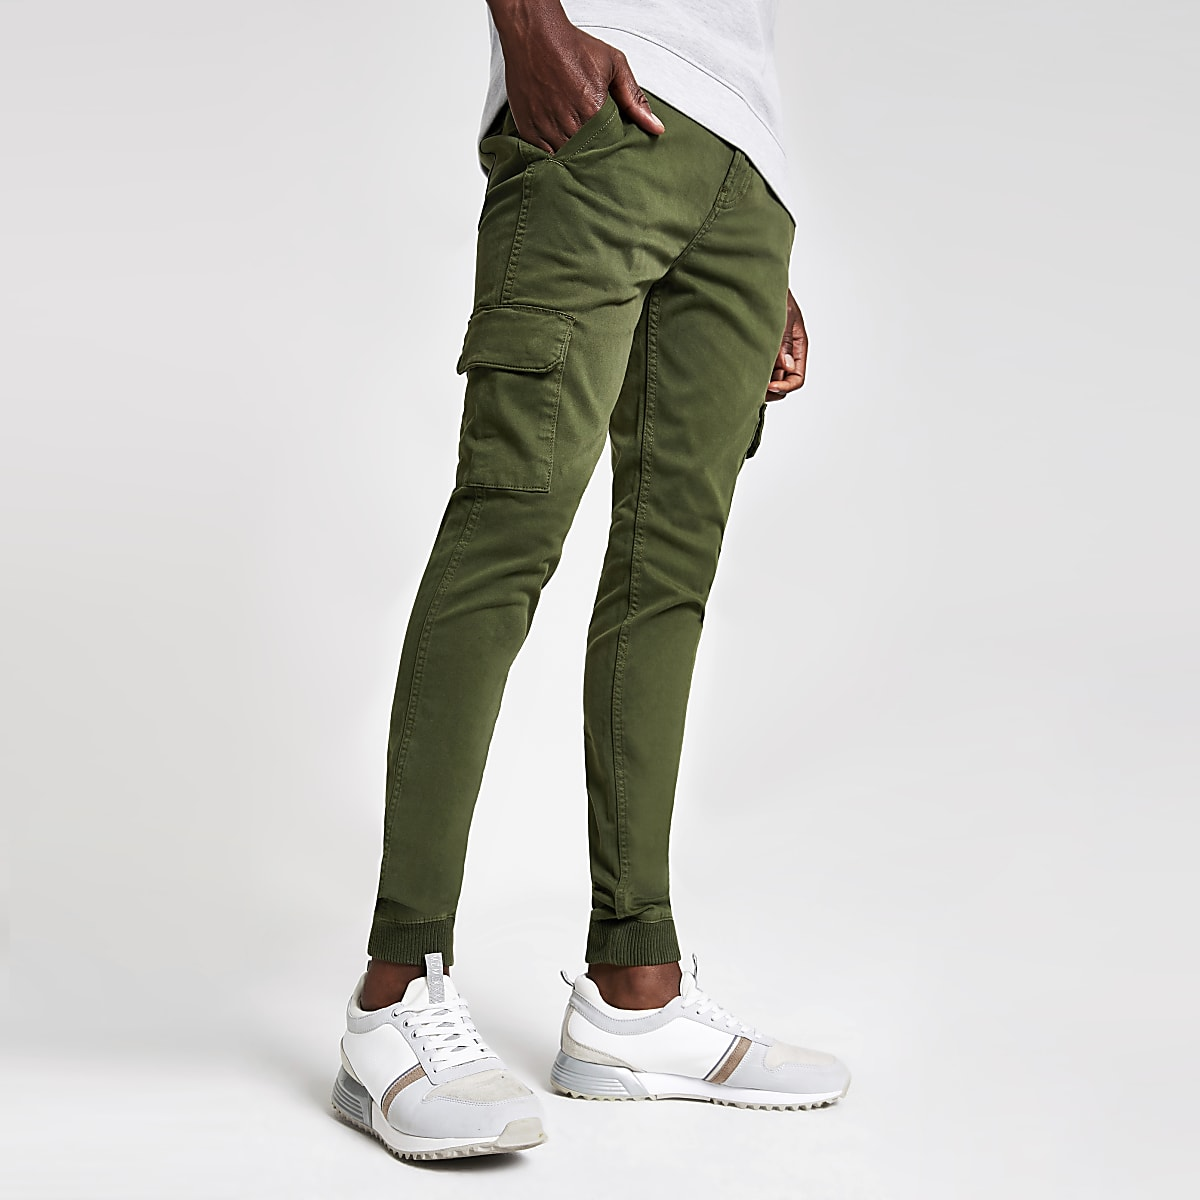 Khaki super skinny cargo pants